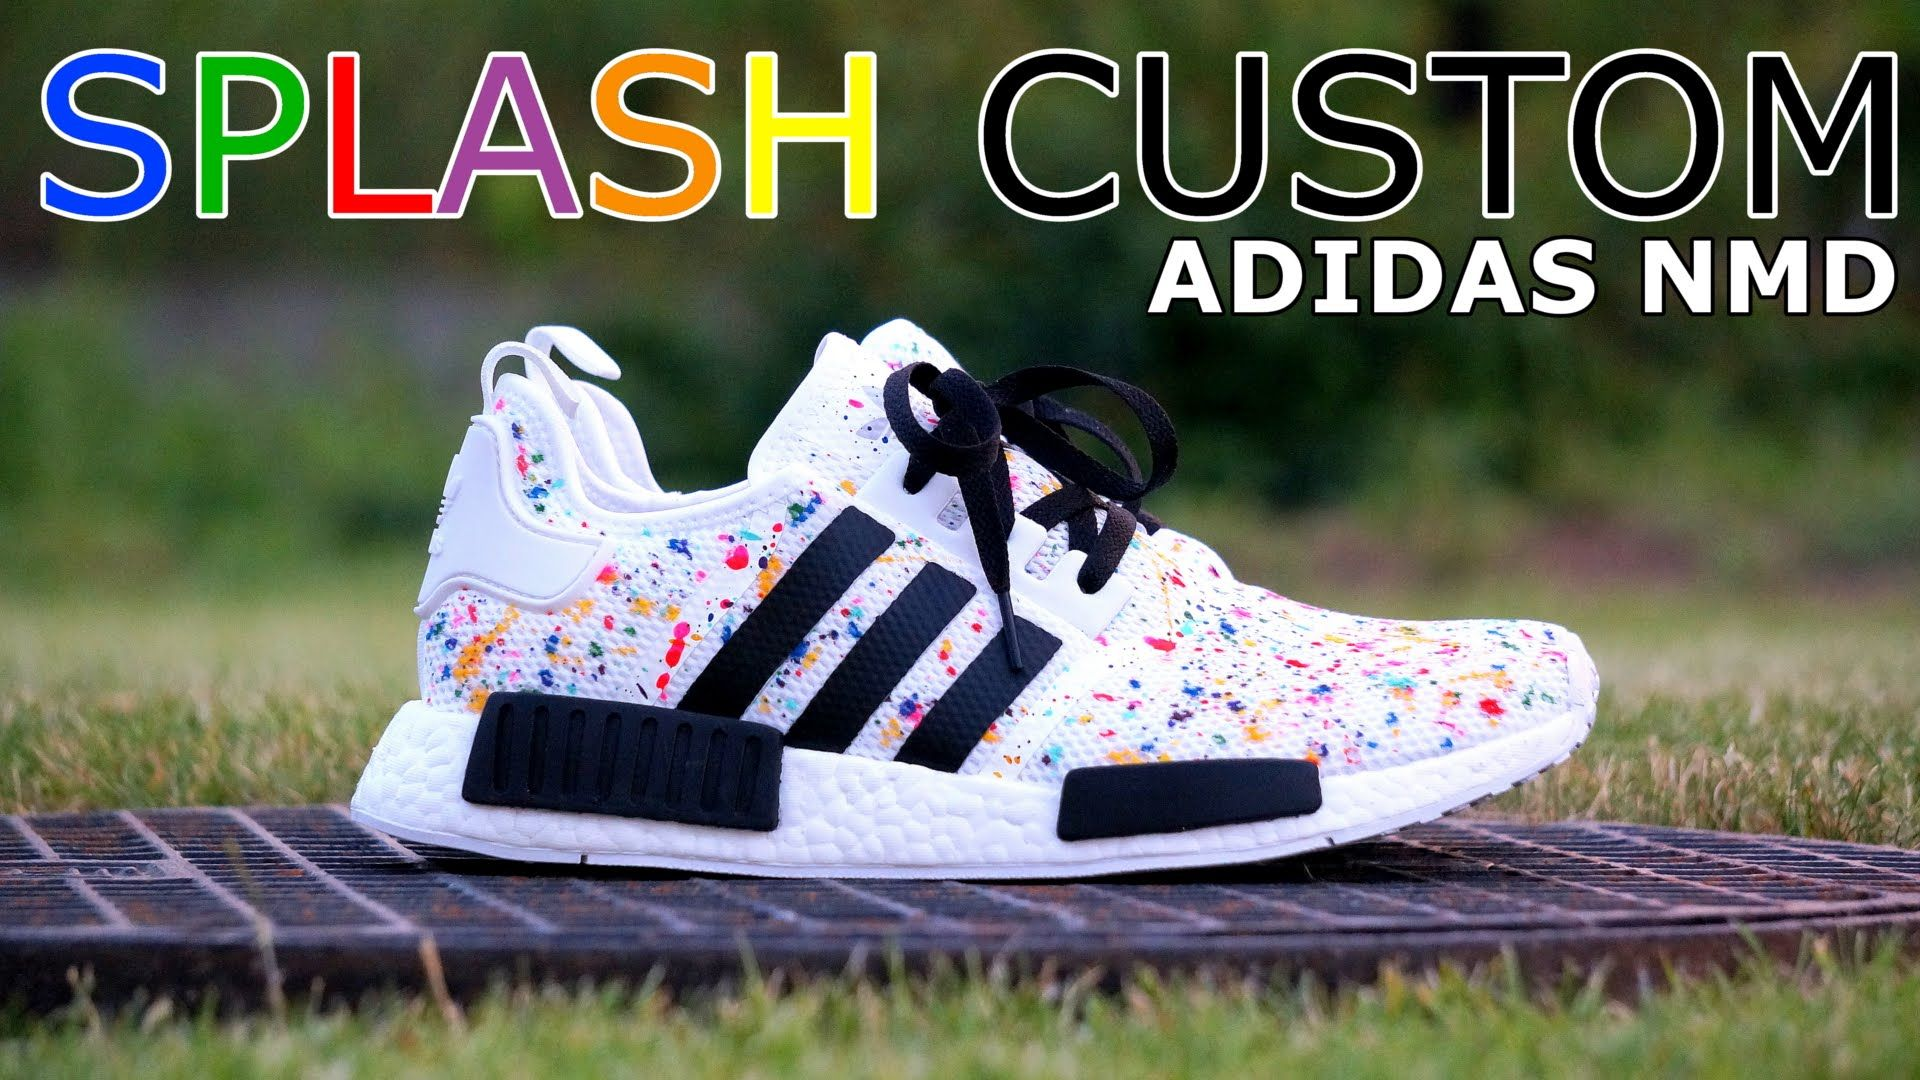 3bebbcdd4fb coupon code for poradnik tutorial adidas nmd multicolor splash custom  angelus paint c7227 af84c